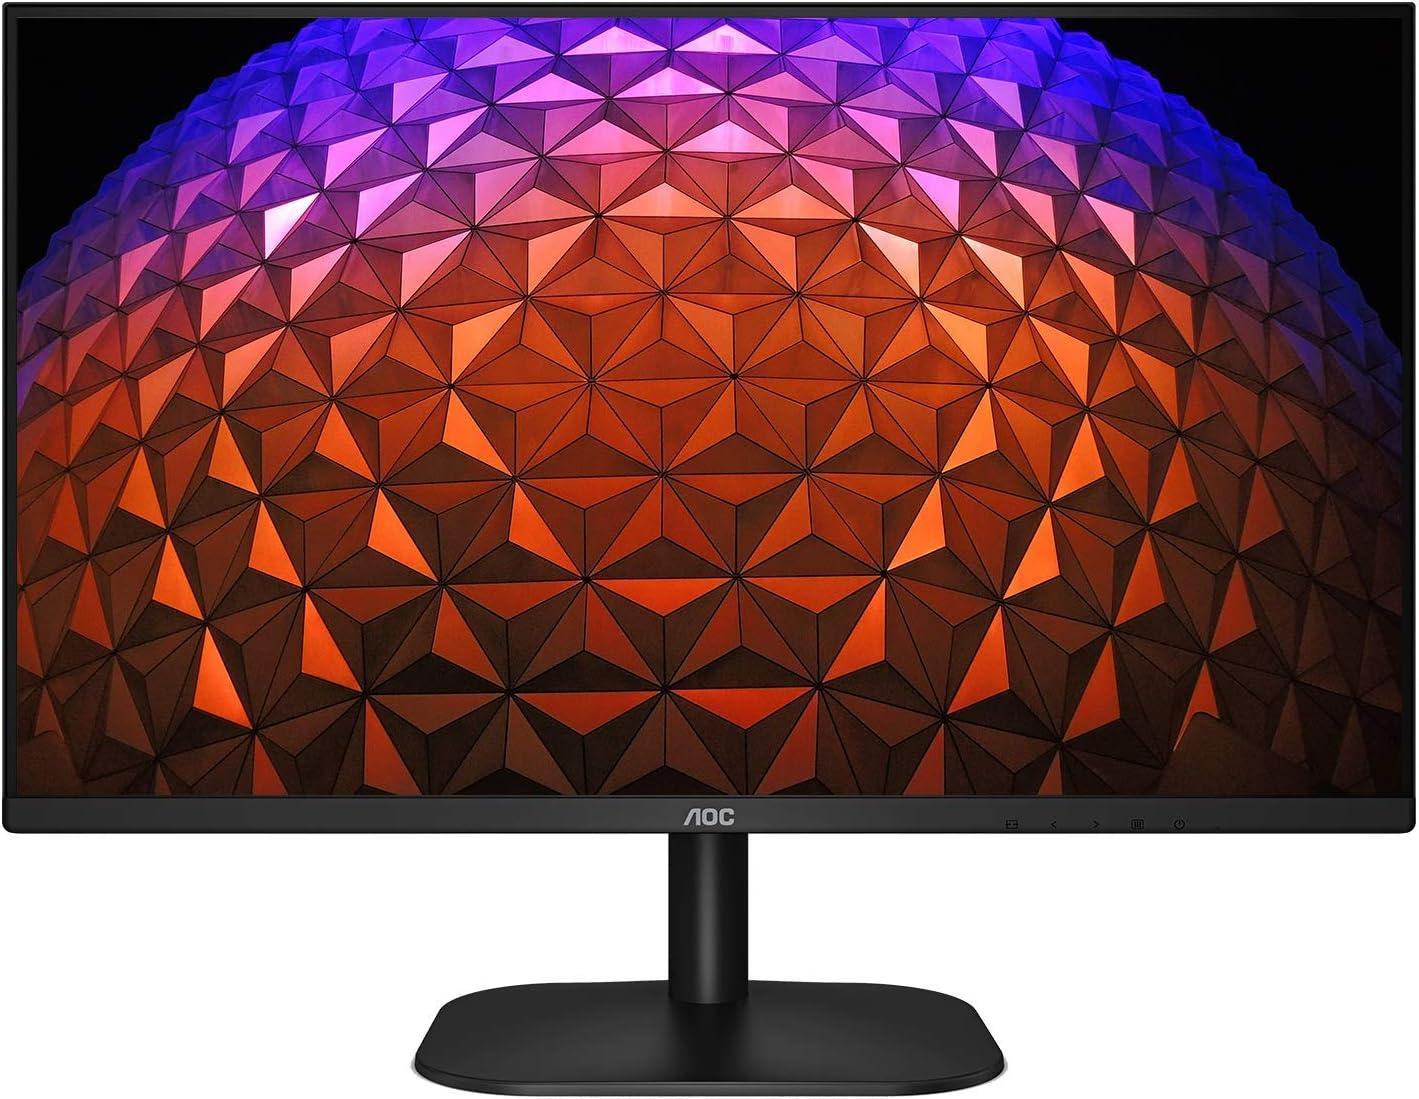 "AOC 27B2H 27"" Full HD IPS Monitor, 3-Sided Frameless & Ultra Slim Design, HDMI and VGA inputs, Lowblue Mode, VESA compatible,Black"